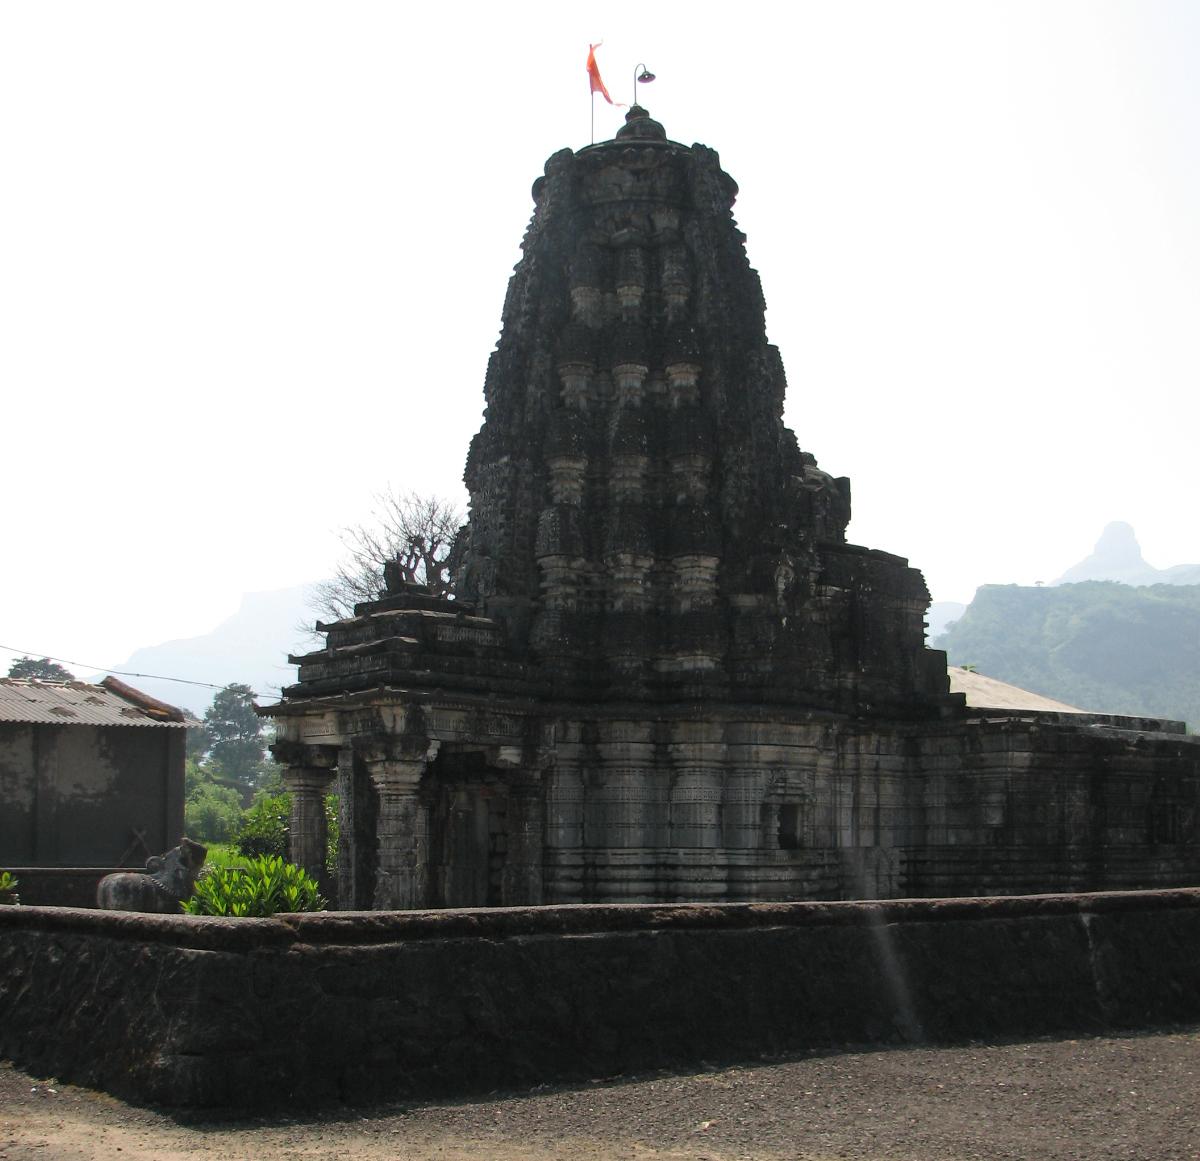 Ratangad Image